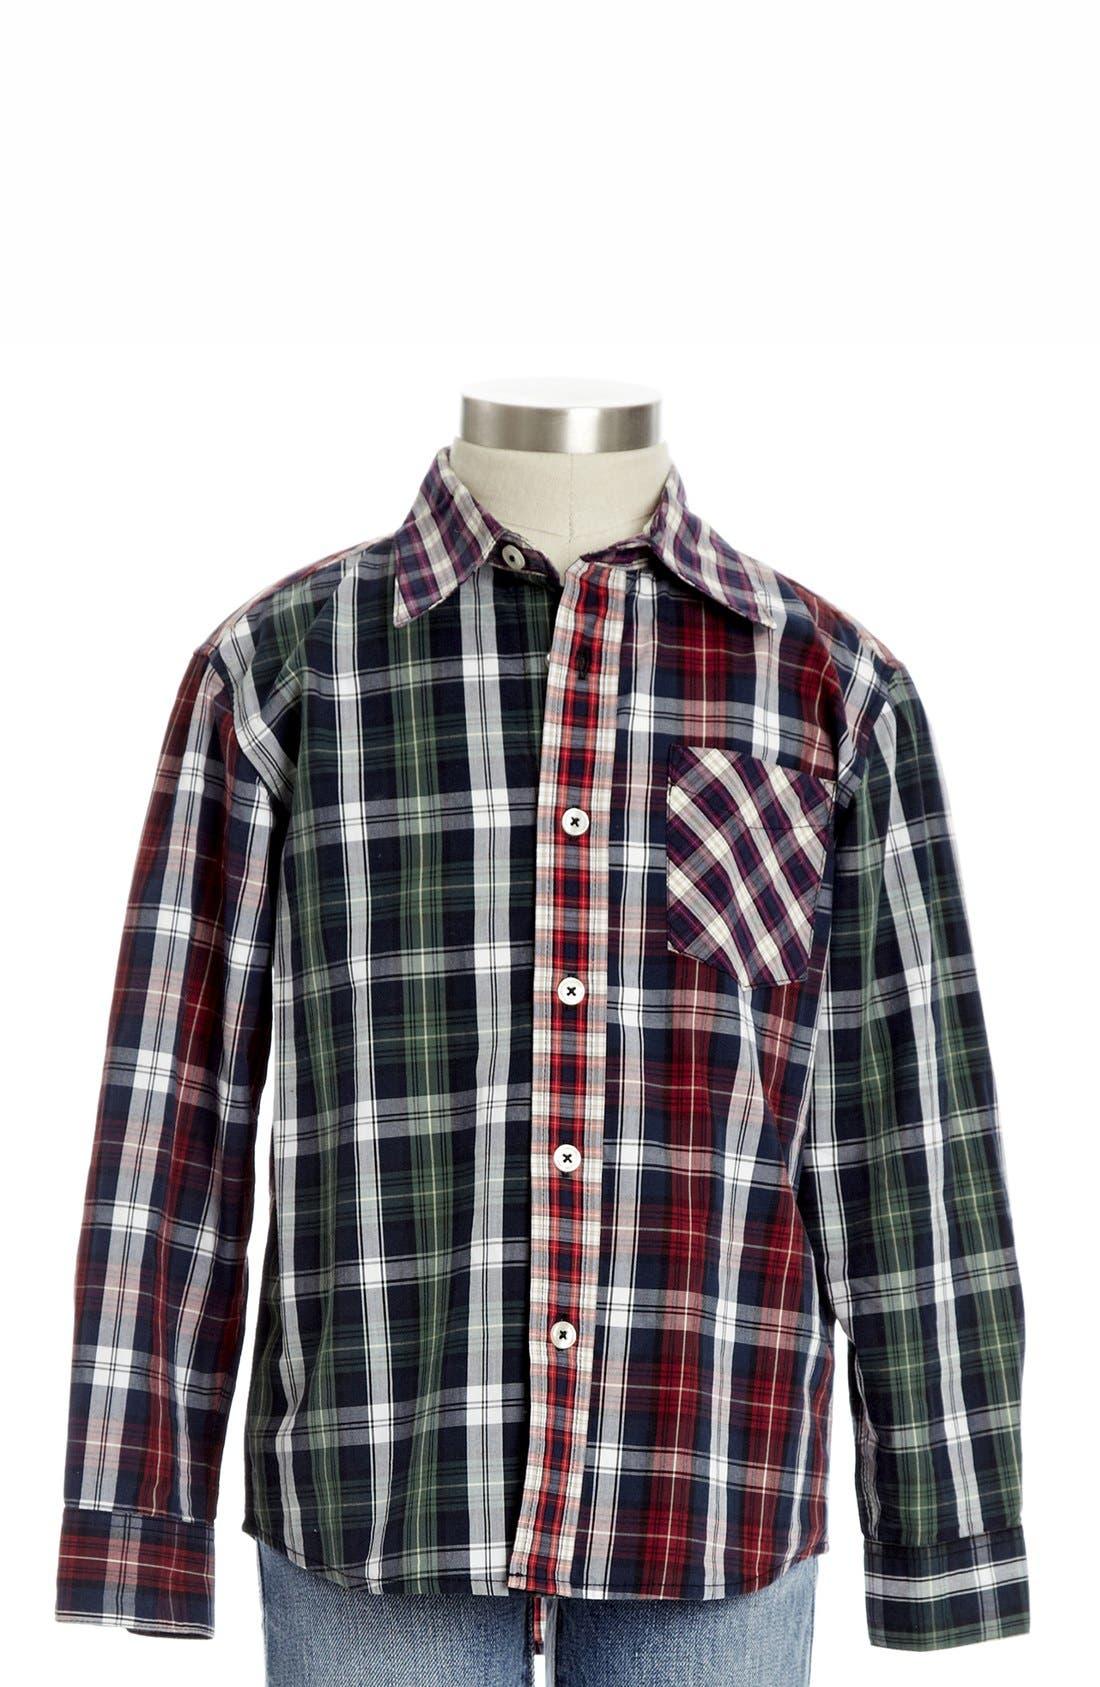 Alternate Image 1 Selected - Peek 'Piedmont' Woven Shirt (Toddler Boys, Little Boys & Big Boys)